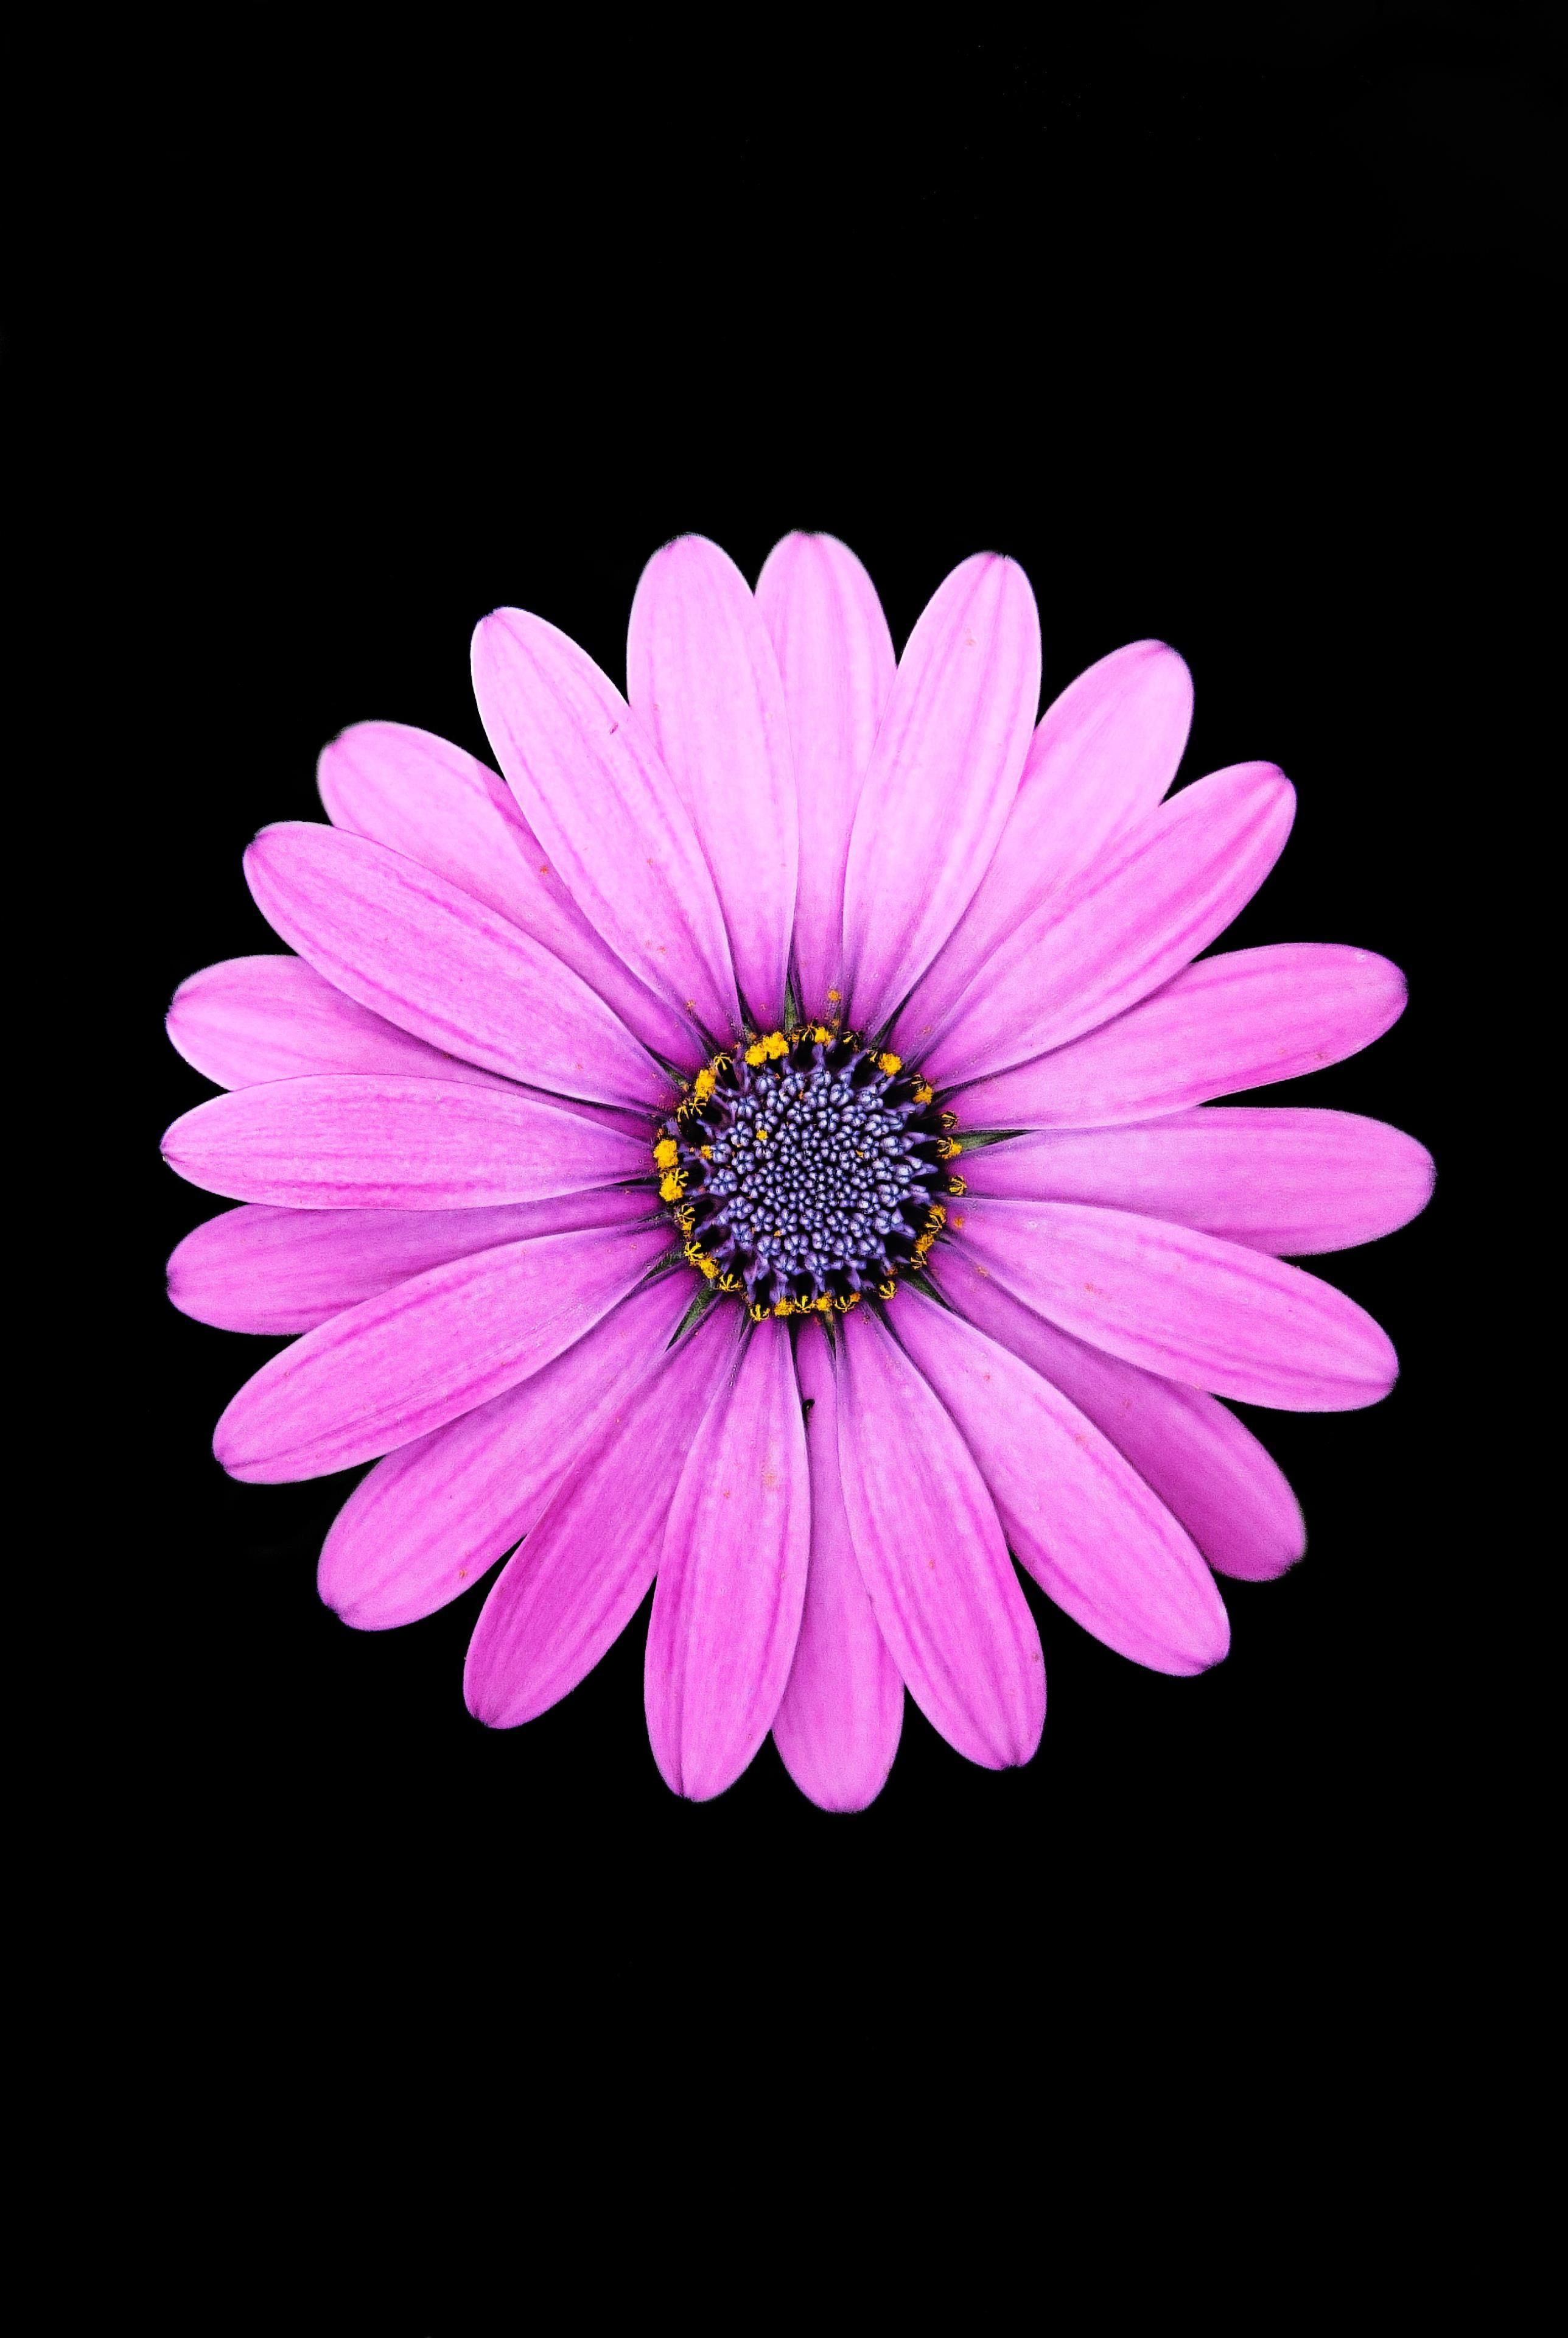 AMOLED Flower Wallpaper Purple daisy, Dark iphone